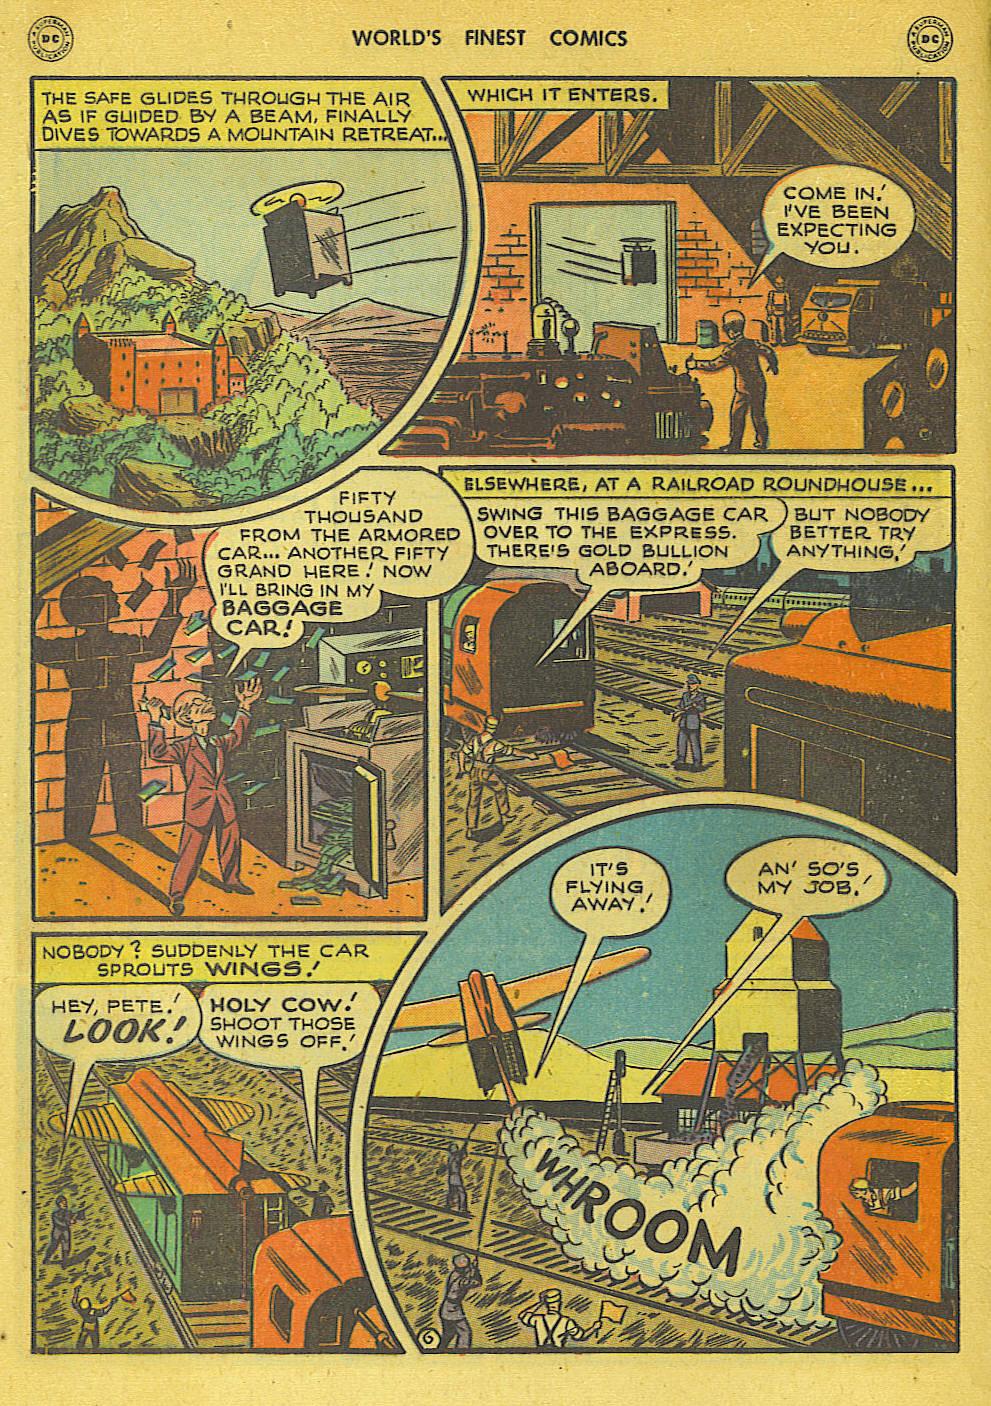 Read online World's Finest Comics comic -  Issue #34 - 46